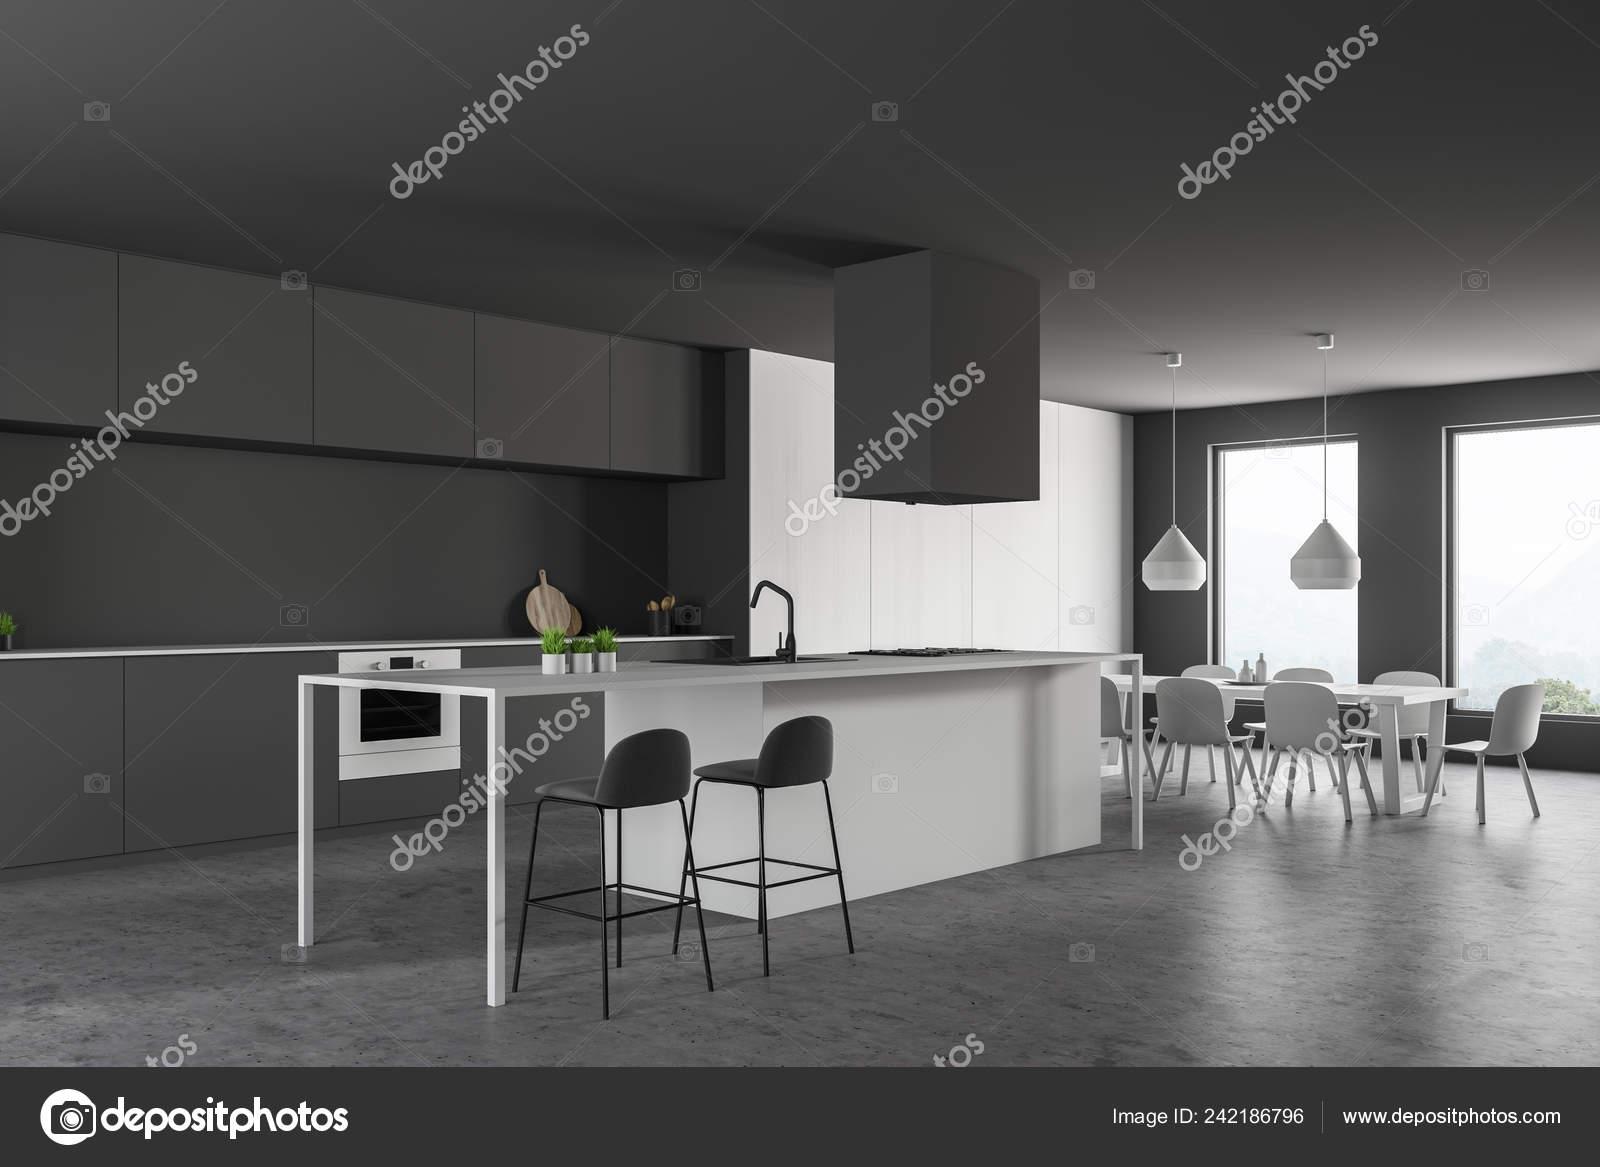 400d6e0d8847 Esquina Cocina Moderna Con Piso Piedra Encimeras Grises Paredes Grises —  Foto de Stock